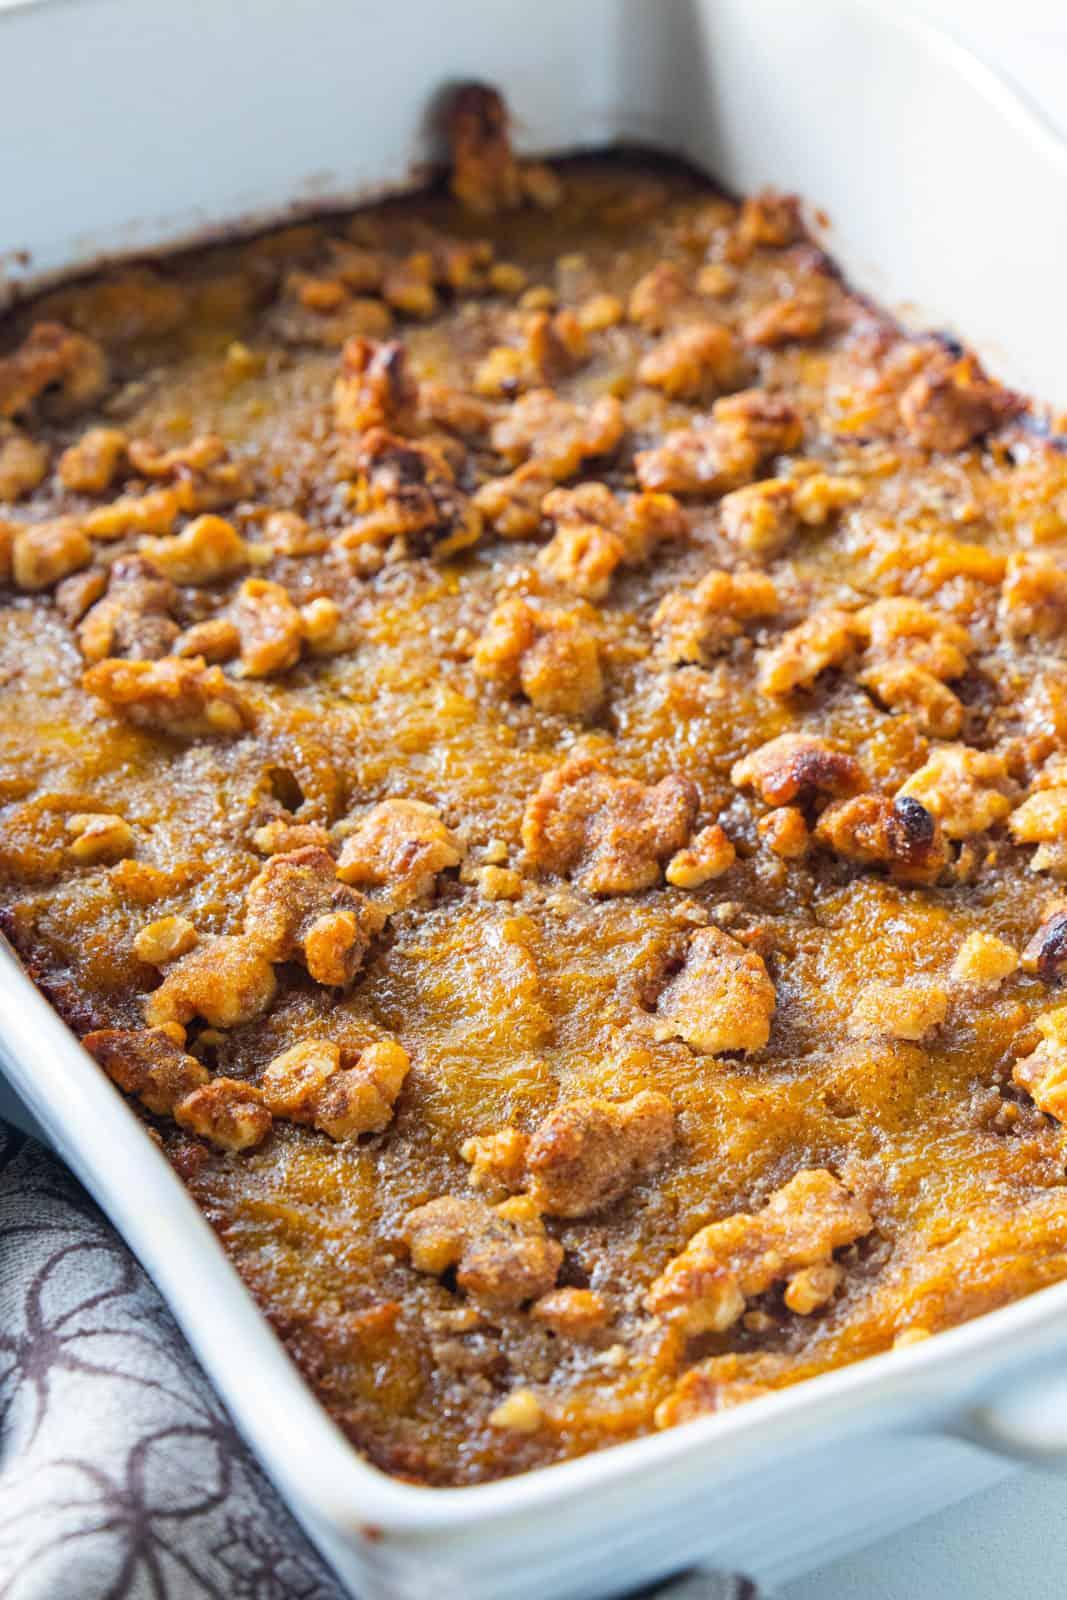 A close up of Sweet potato casserole